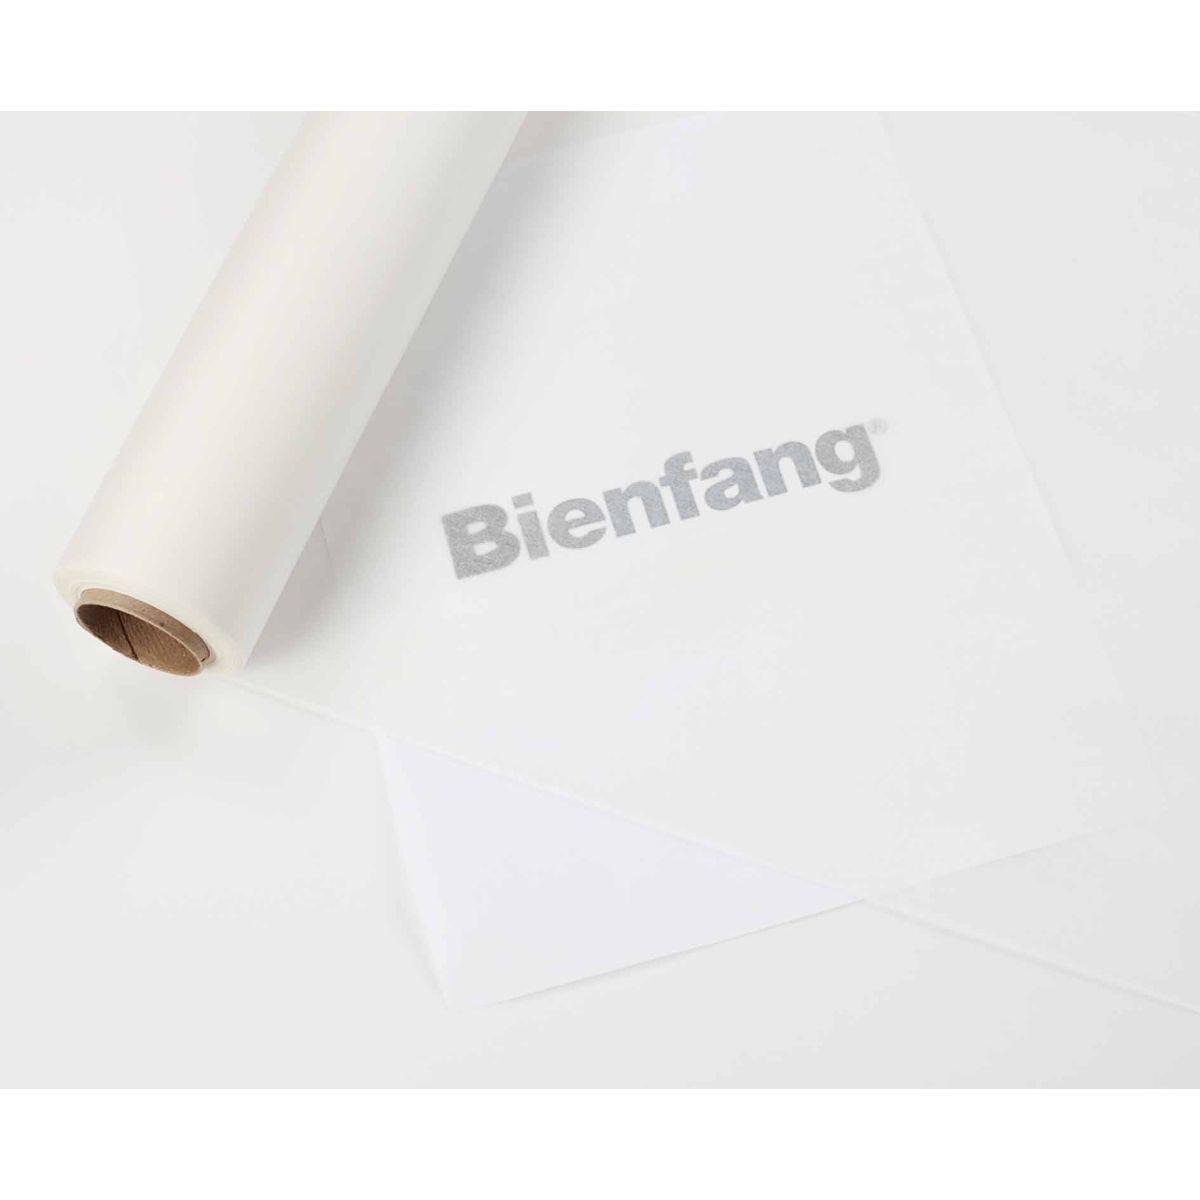 Bienfang Sketching Detail Paper Roll 35gm 304mm x 45.72 Metre White